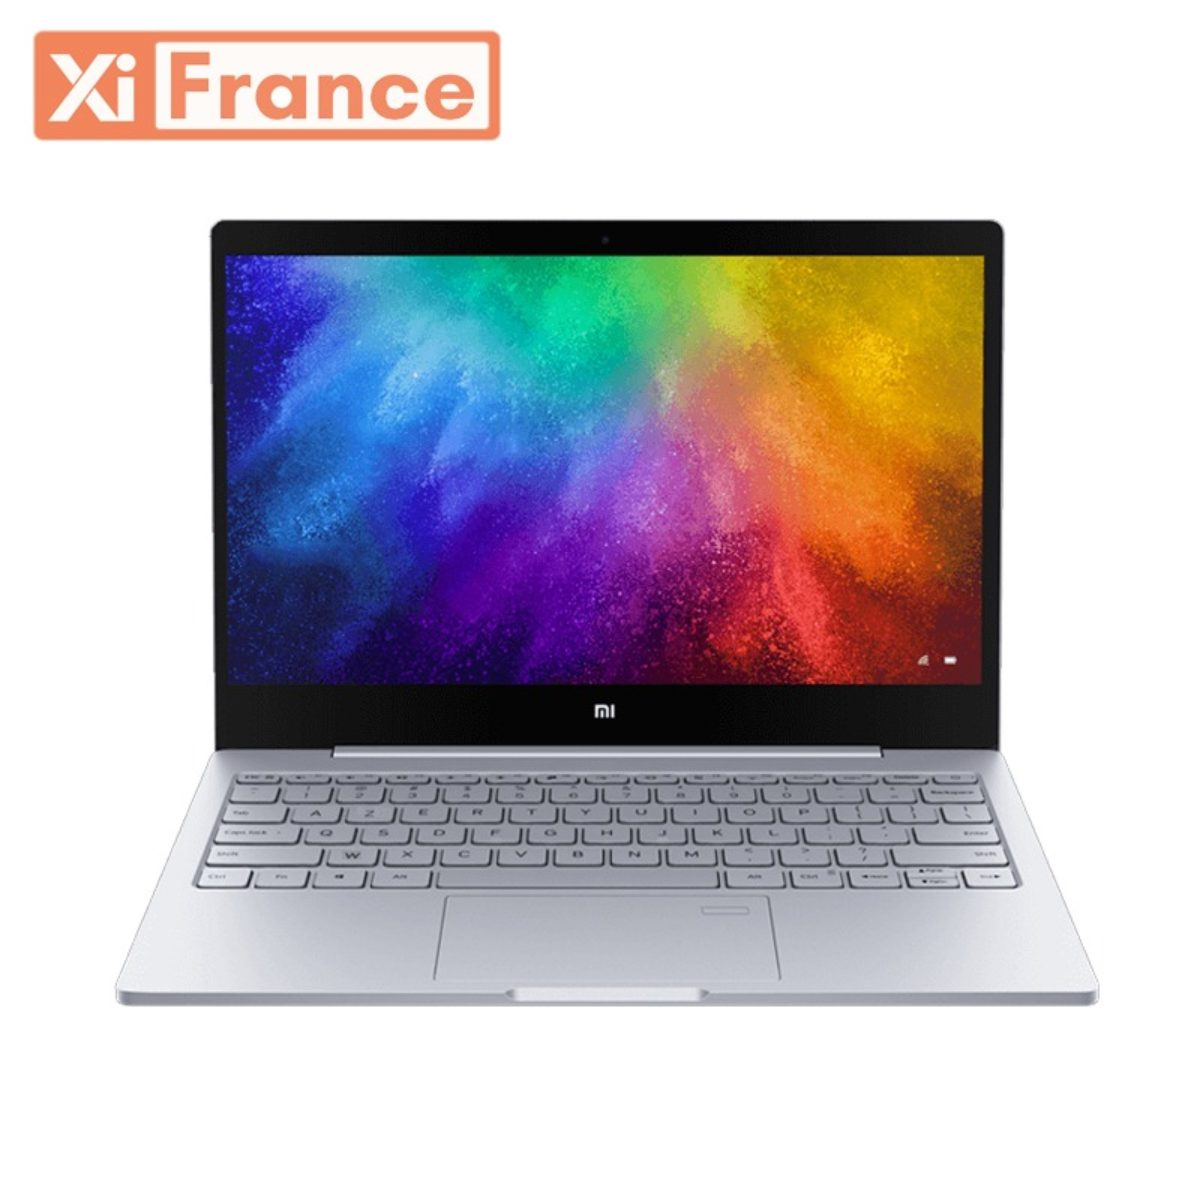 AZERTY pour Xiaomi Notebook Air 12.5 et 13.3 XiFrance